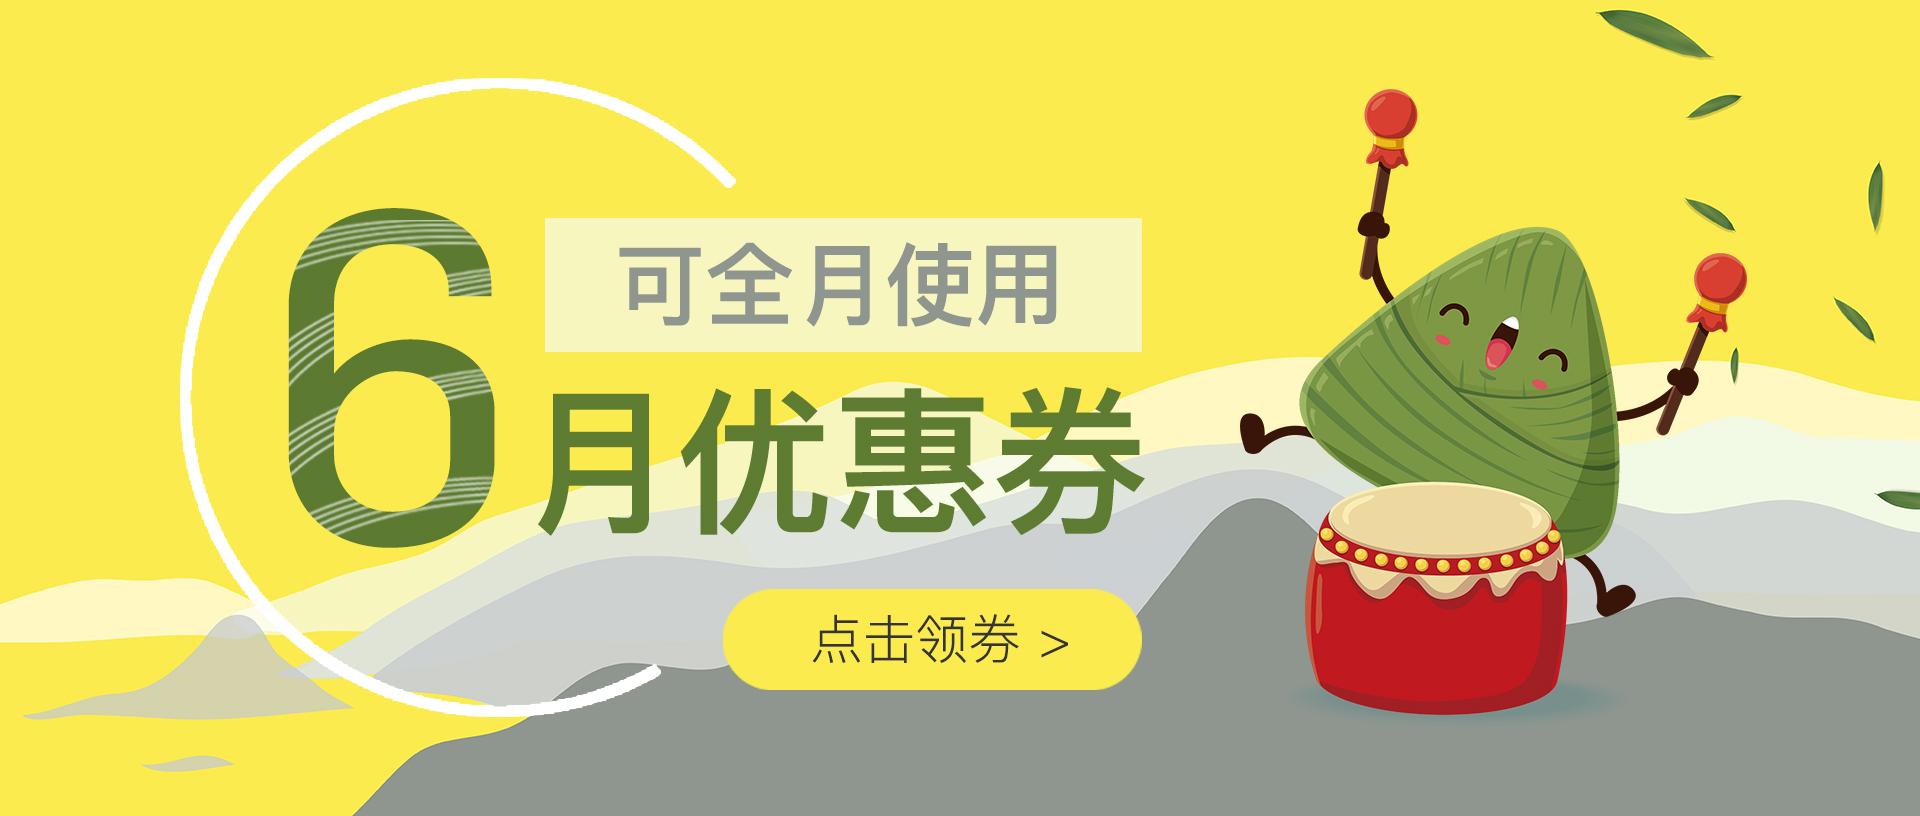 绿林美框春季优惠banner